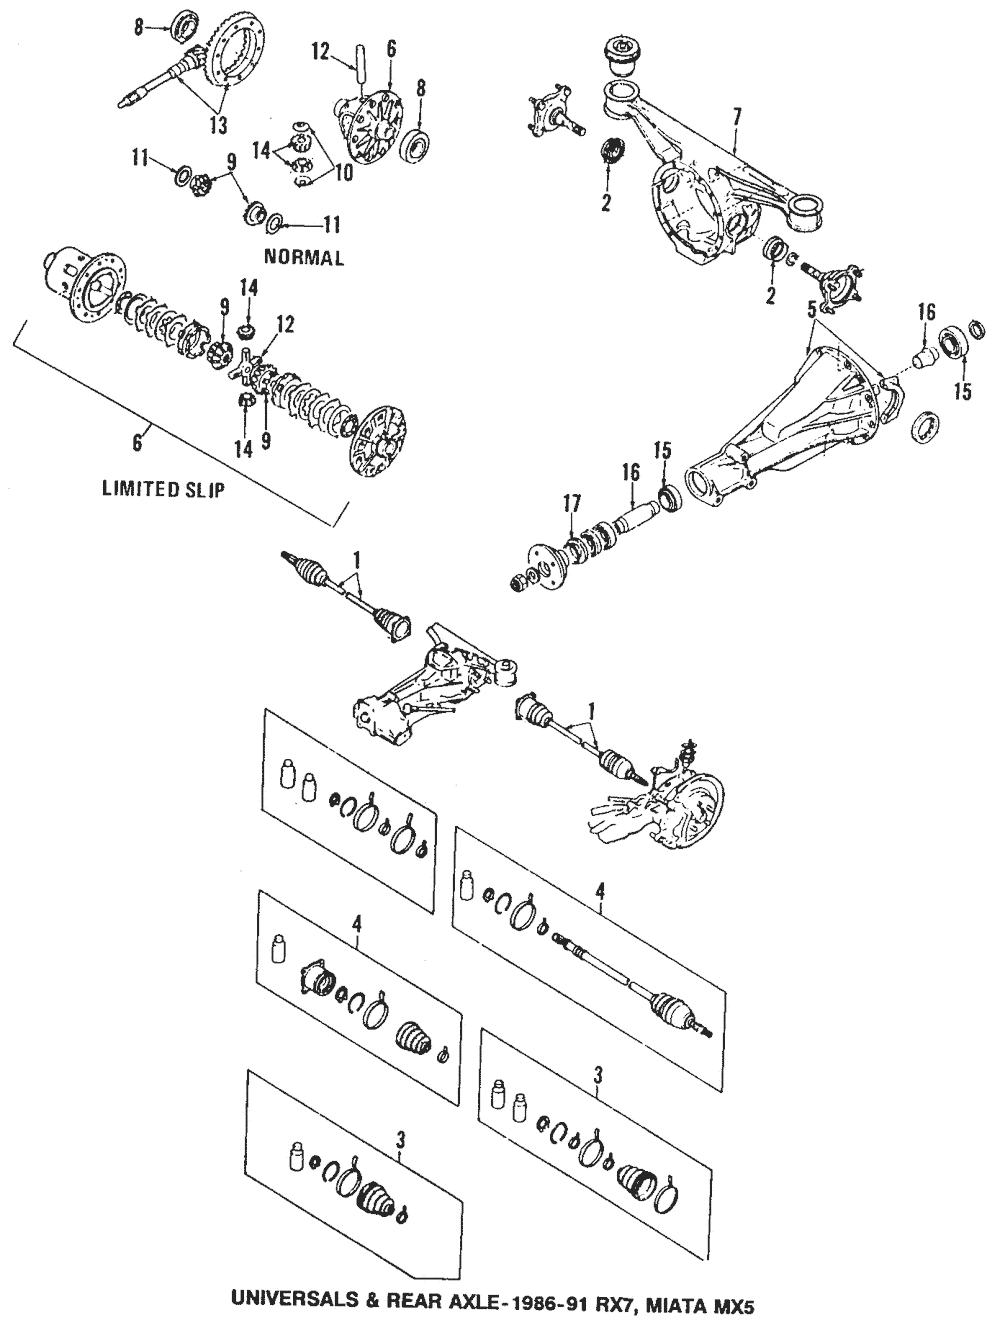 OEM NEW 86-15 Mazda 5 2 3 CX-7 Manual Transmission Output